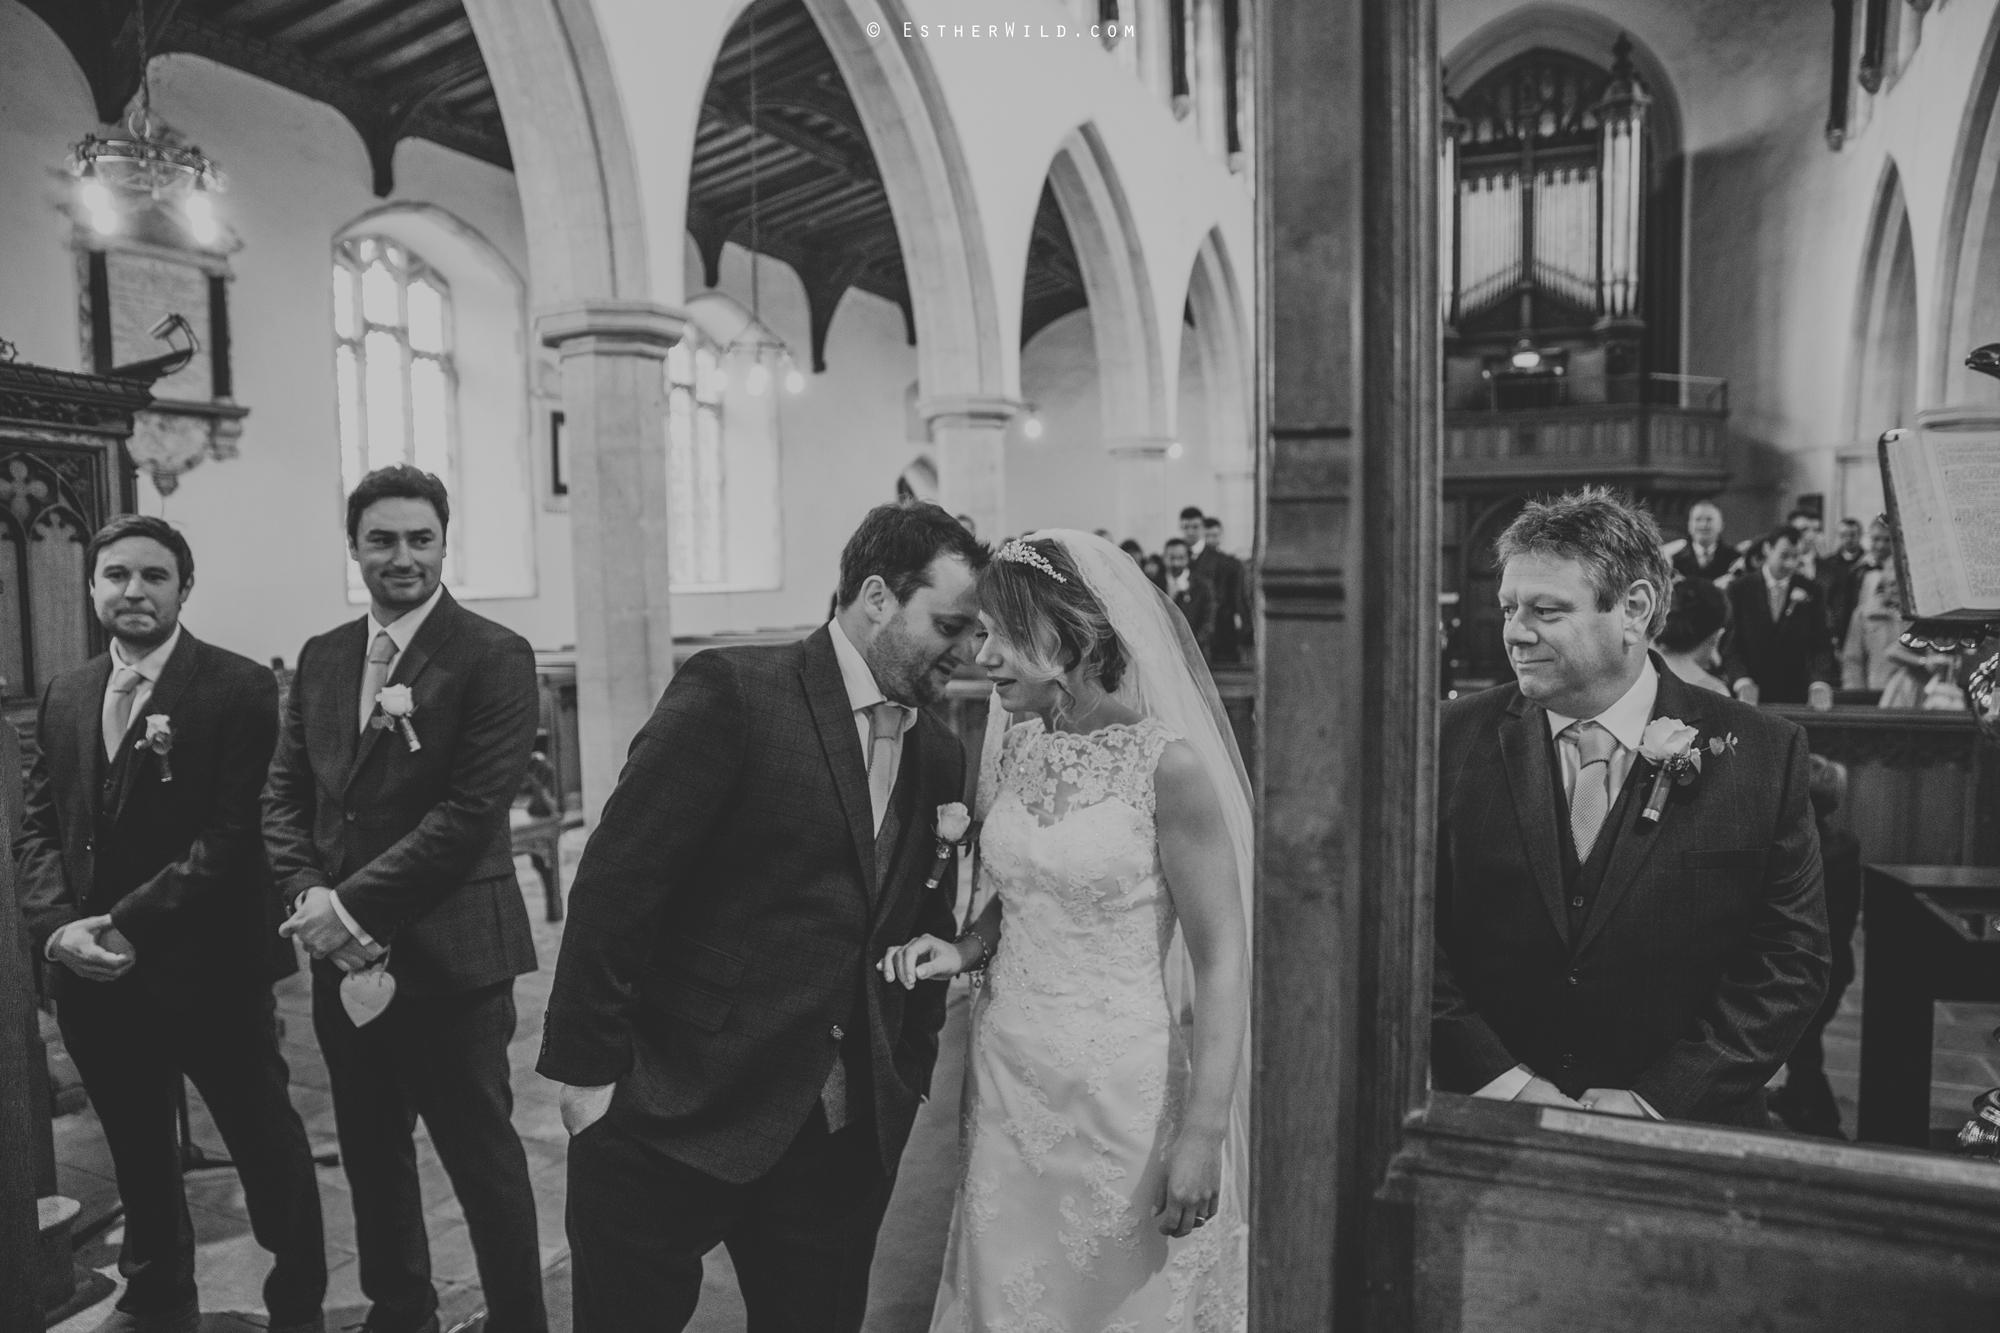 Wedding_Photography_Diss_Gawdy_Hall_Redenhall_Church_Norfolk_Winter_Esther_Wild_Copyright_IMG_1119-2.jpg